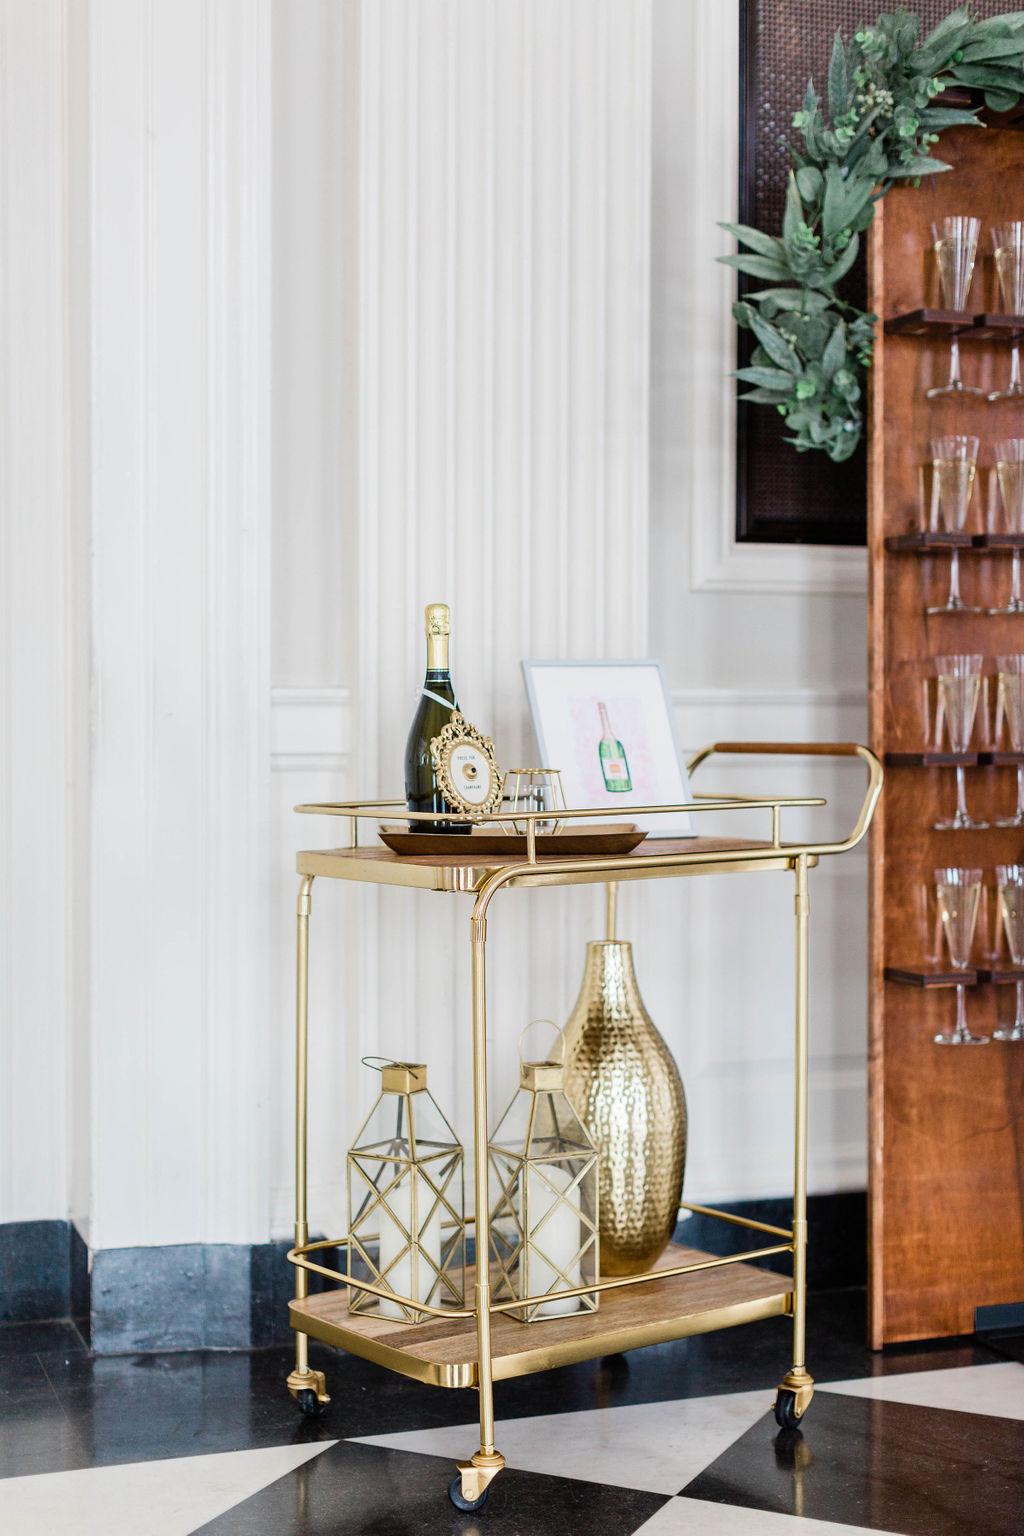 Bar Cart | Wedding Bar Ideas | Gold Wedding | Champagne Wall | Champagne Wall | Wedding Champagne | Chicago History Museum | Black Tie Wedding | Your Day by MK | Chicago Wedding Planner